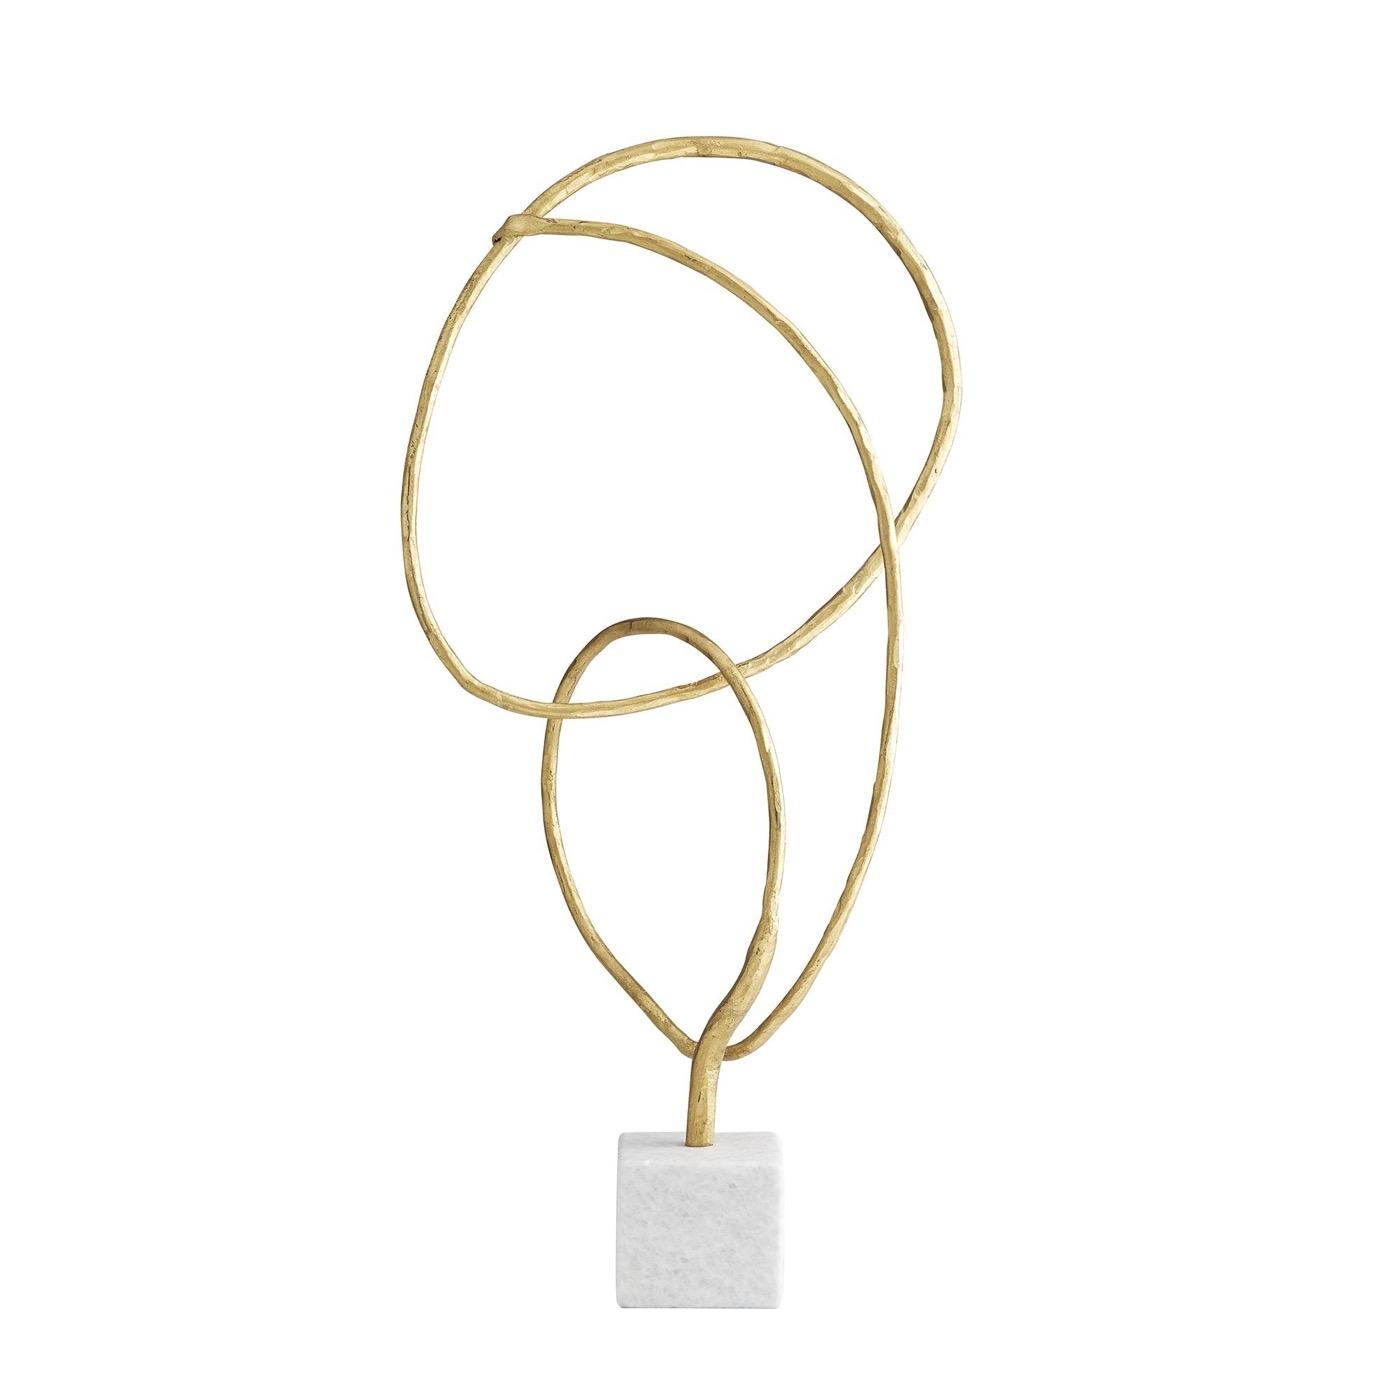 Looper Iron Sculpture | Gold